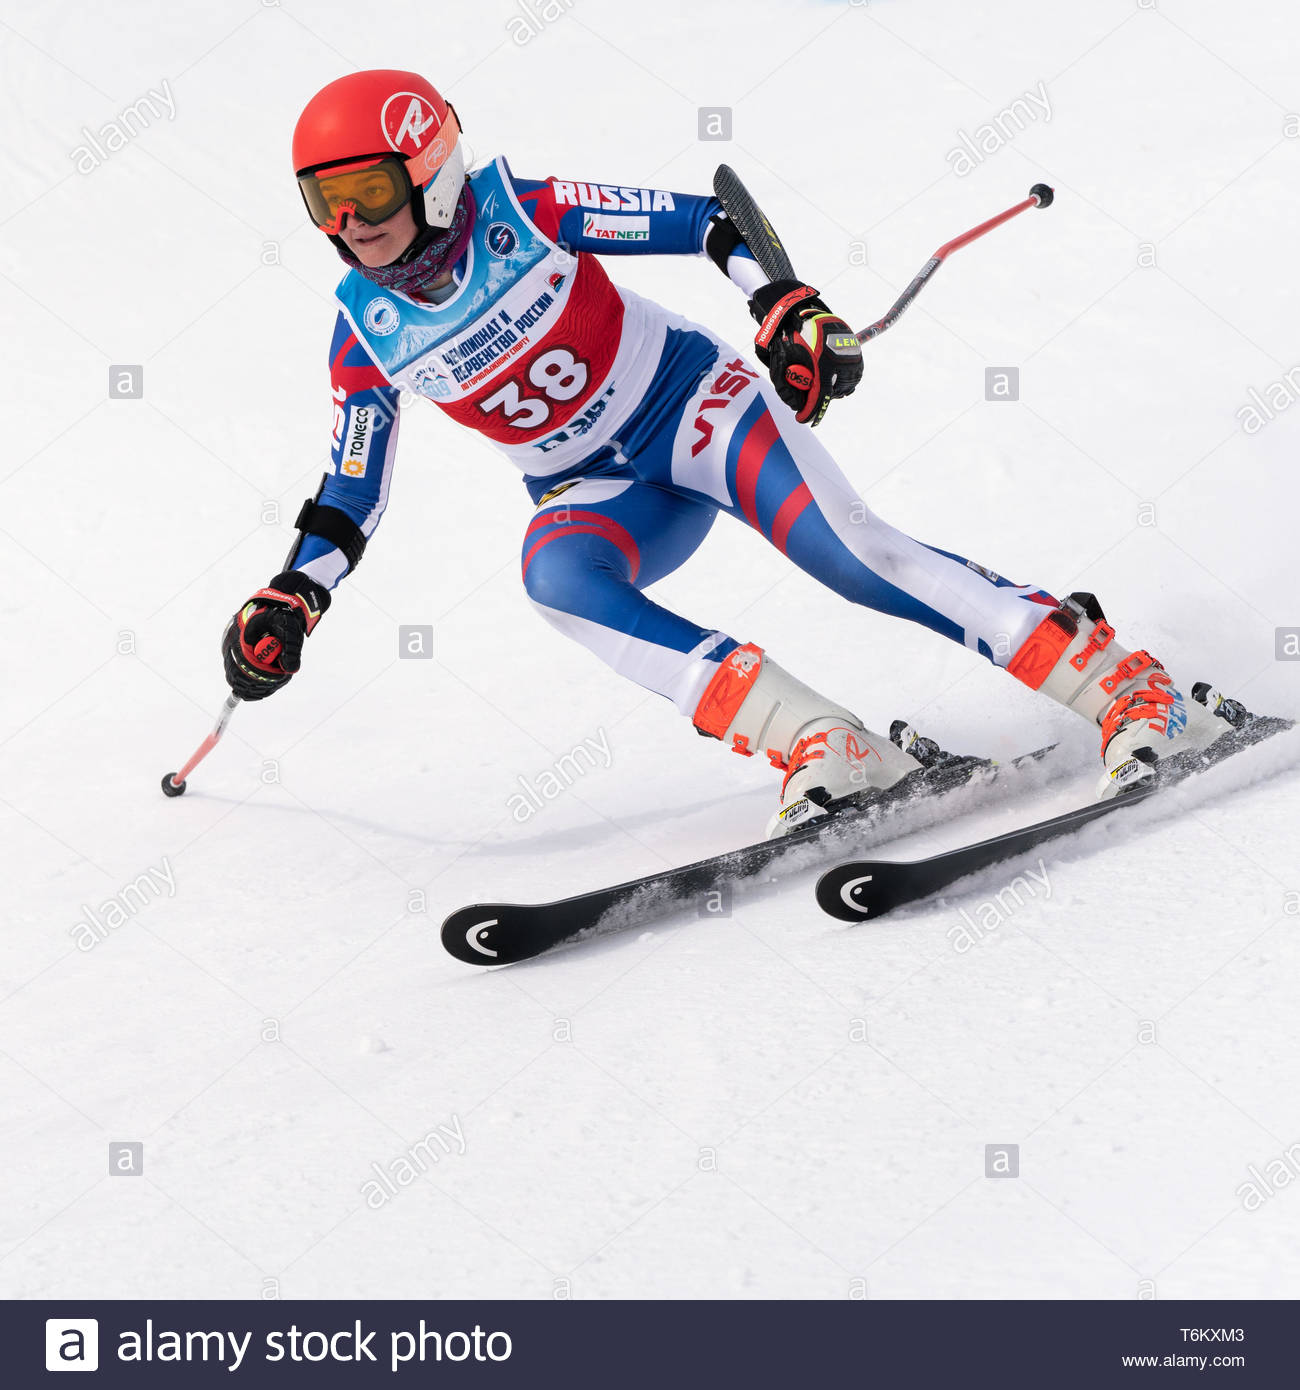 KAMCHATKA PENINSULA, RUSSIA - APRIL 2, 2019: Mountain skier Sofya Arkhipova (Sverdlovsk) skiing down mount. Russian Women's Alpine Skiing Cup, Interna - Stock Image